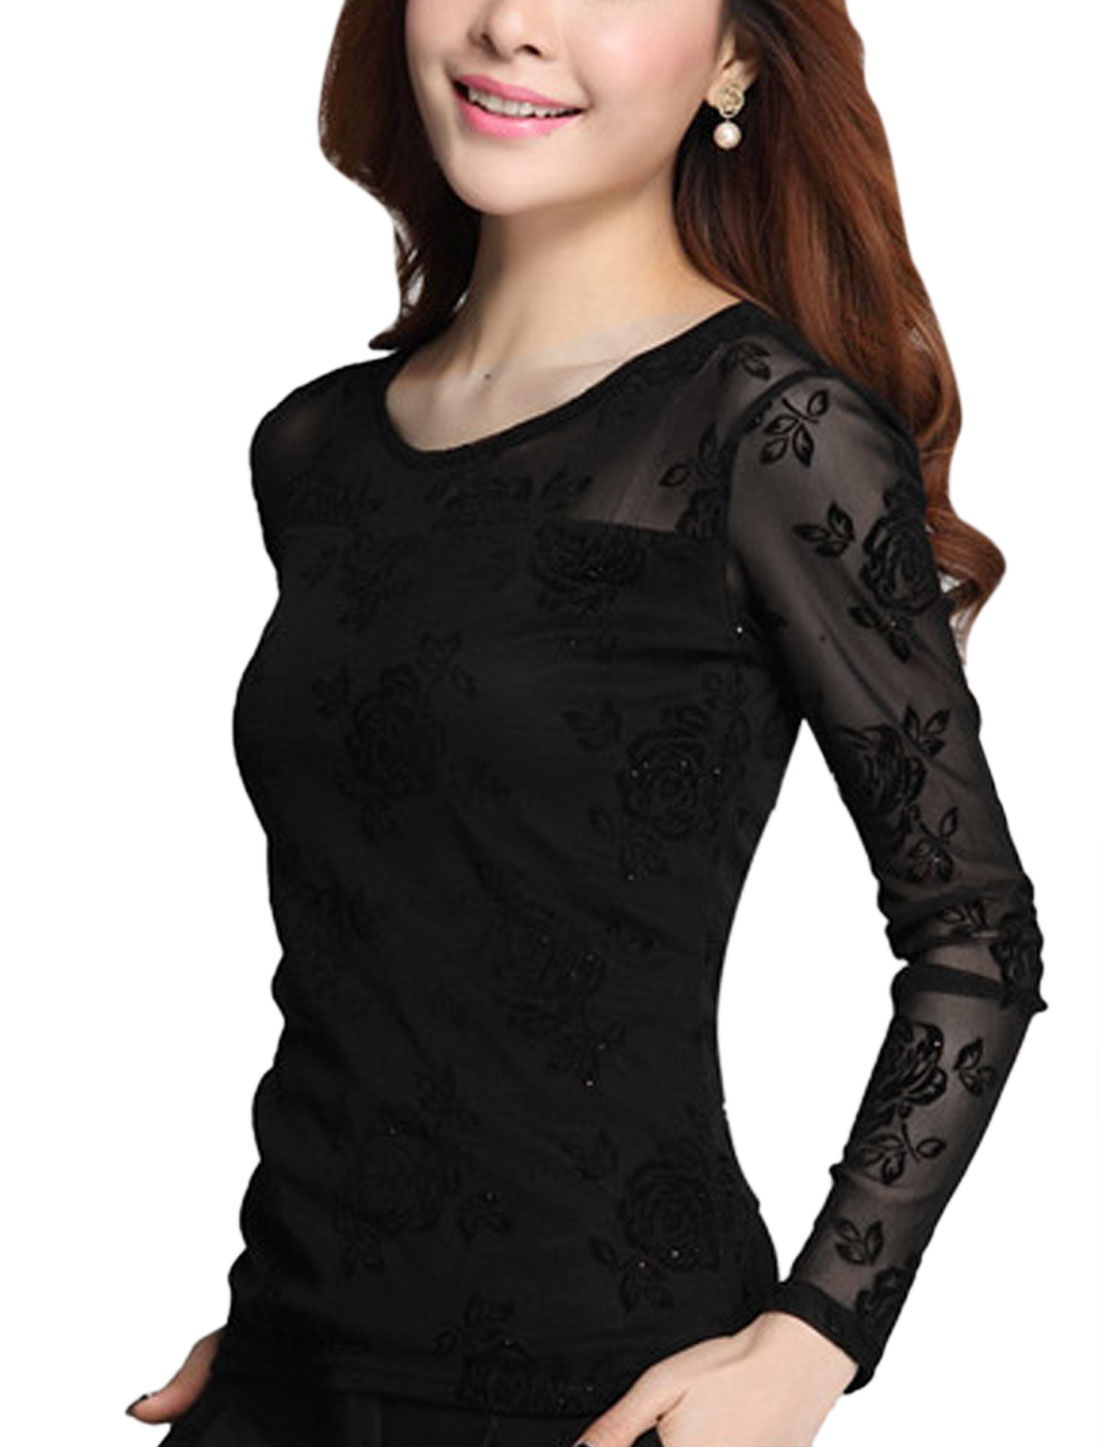 Lady Mesh Overlay Semi Sheer Floral Prints Shiny Design T-Shirt Black M